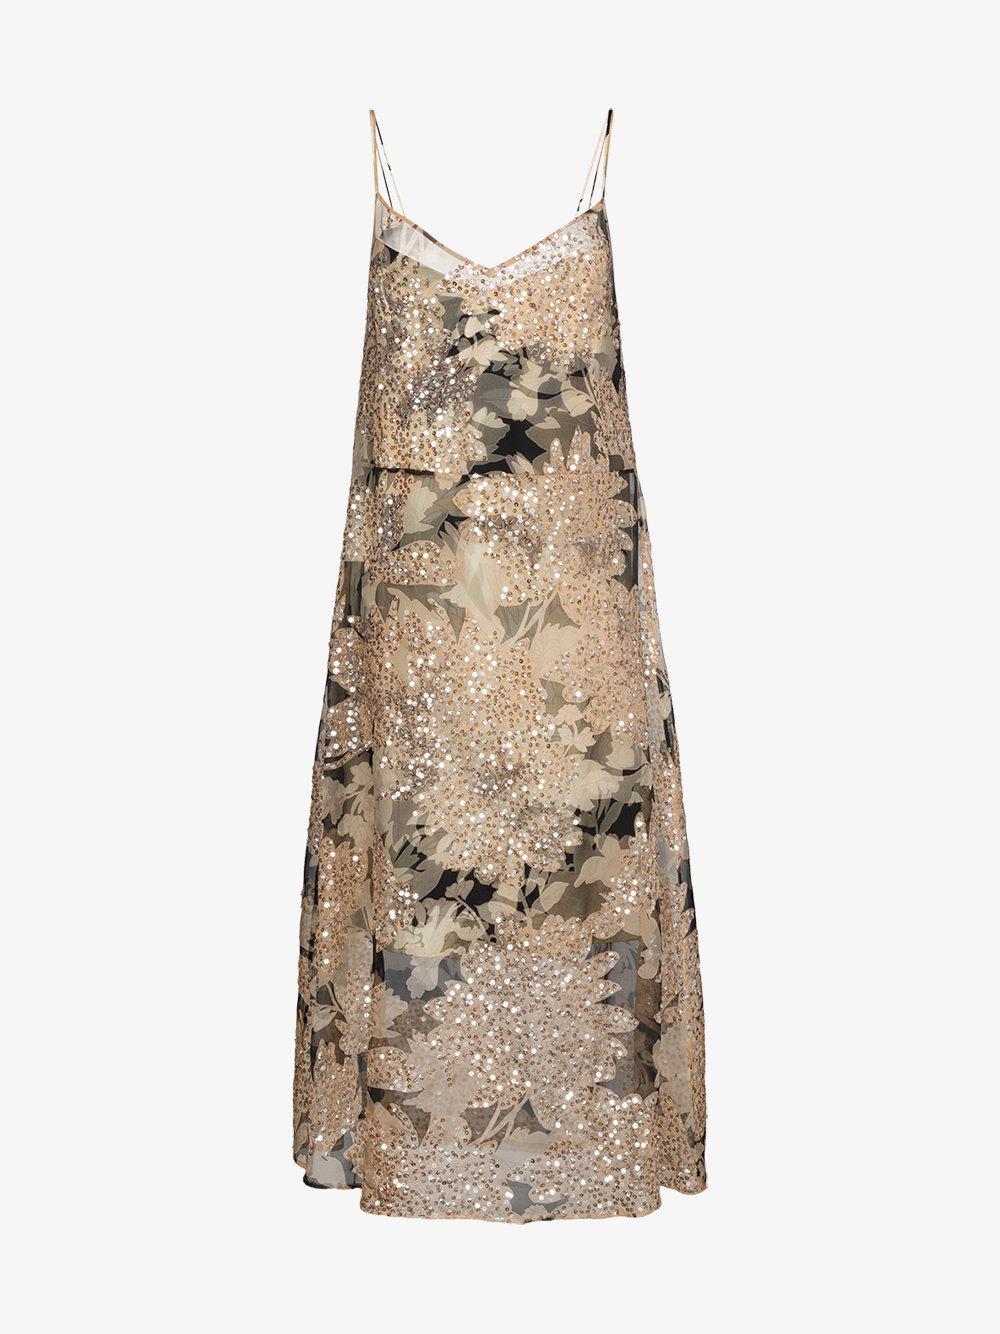 Dries Van Noten Strappy Floral Sequinned Dress In Nude & Neutrals